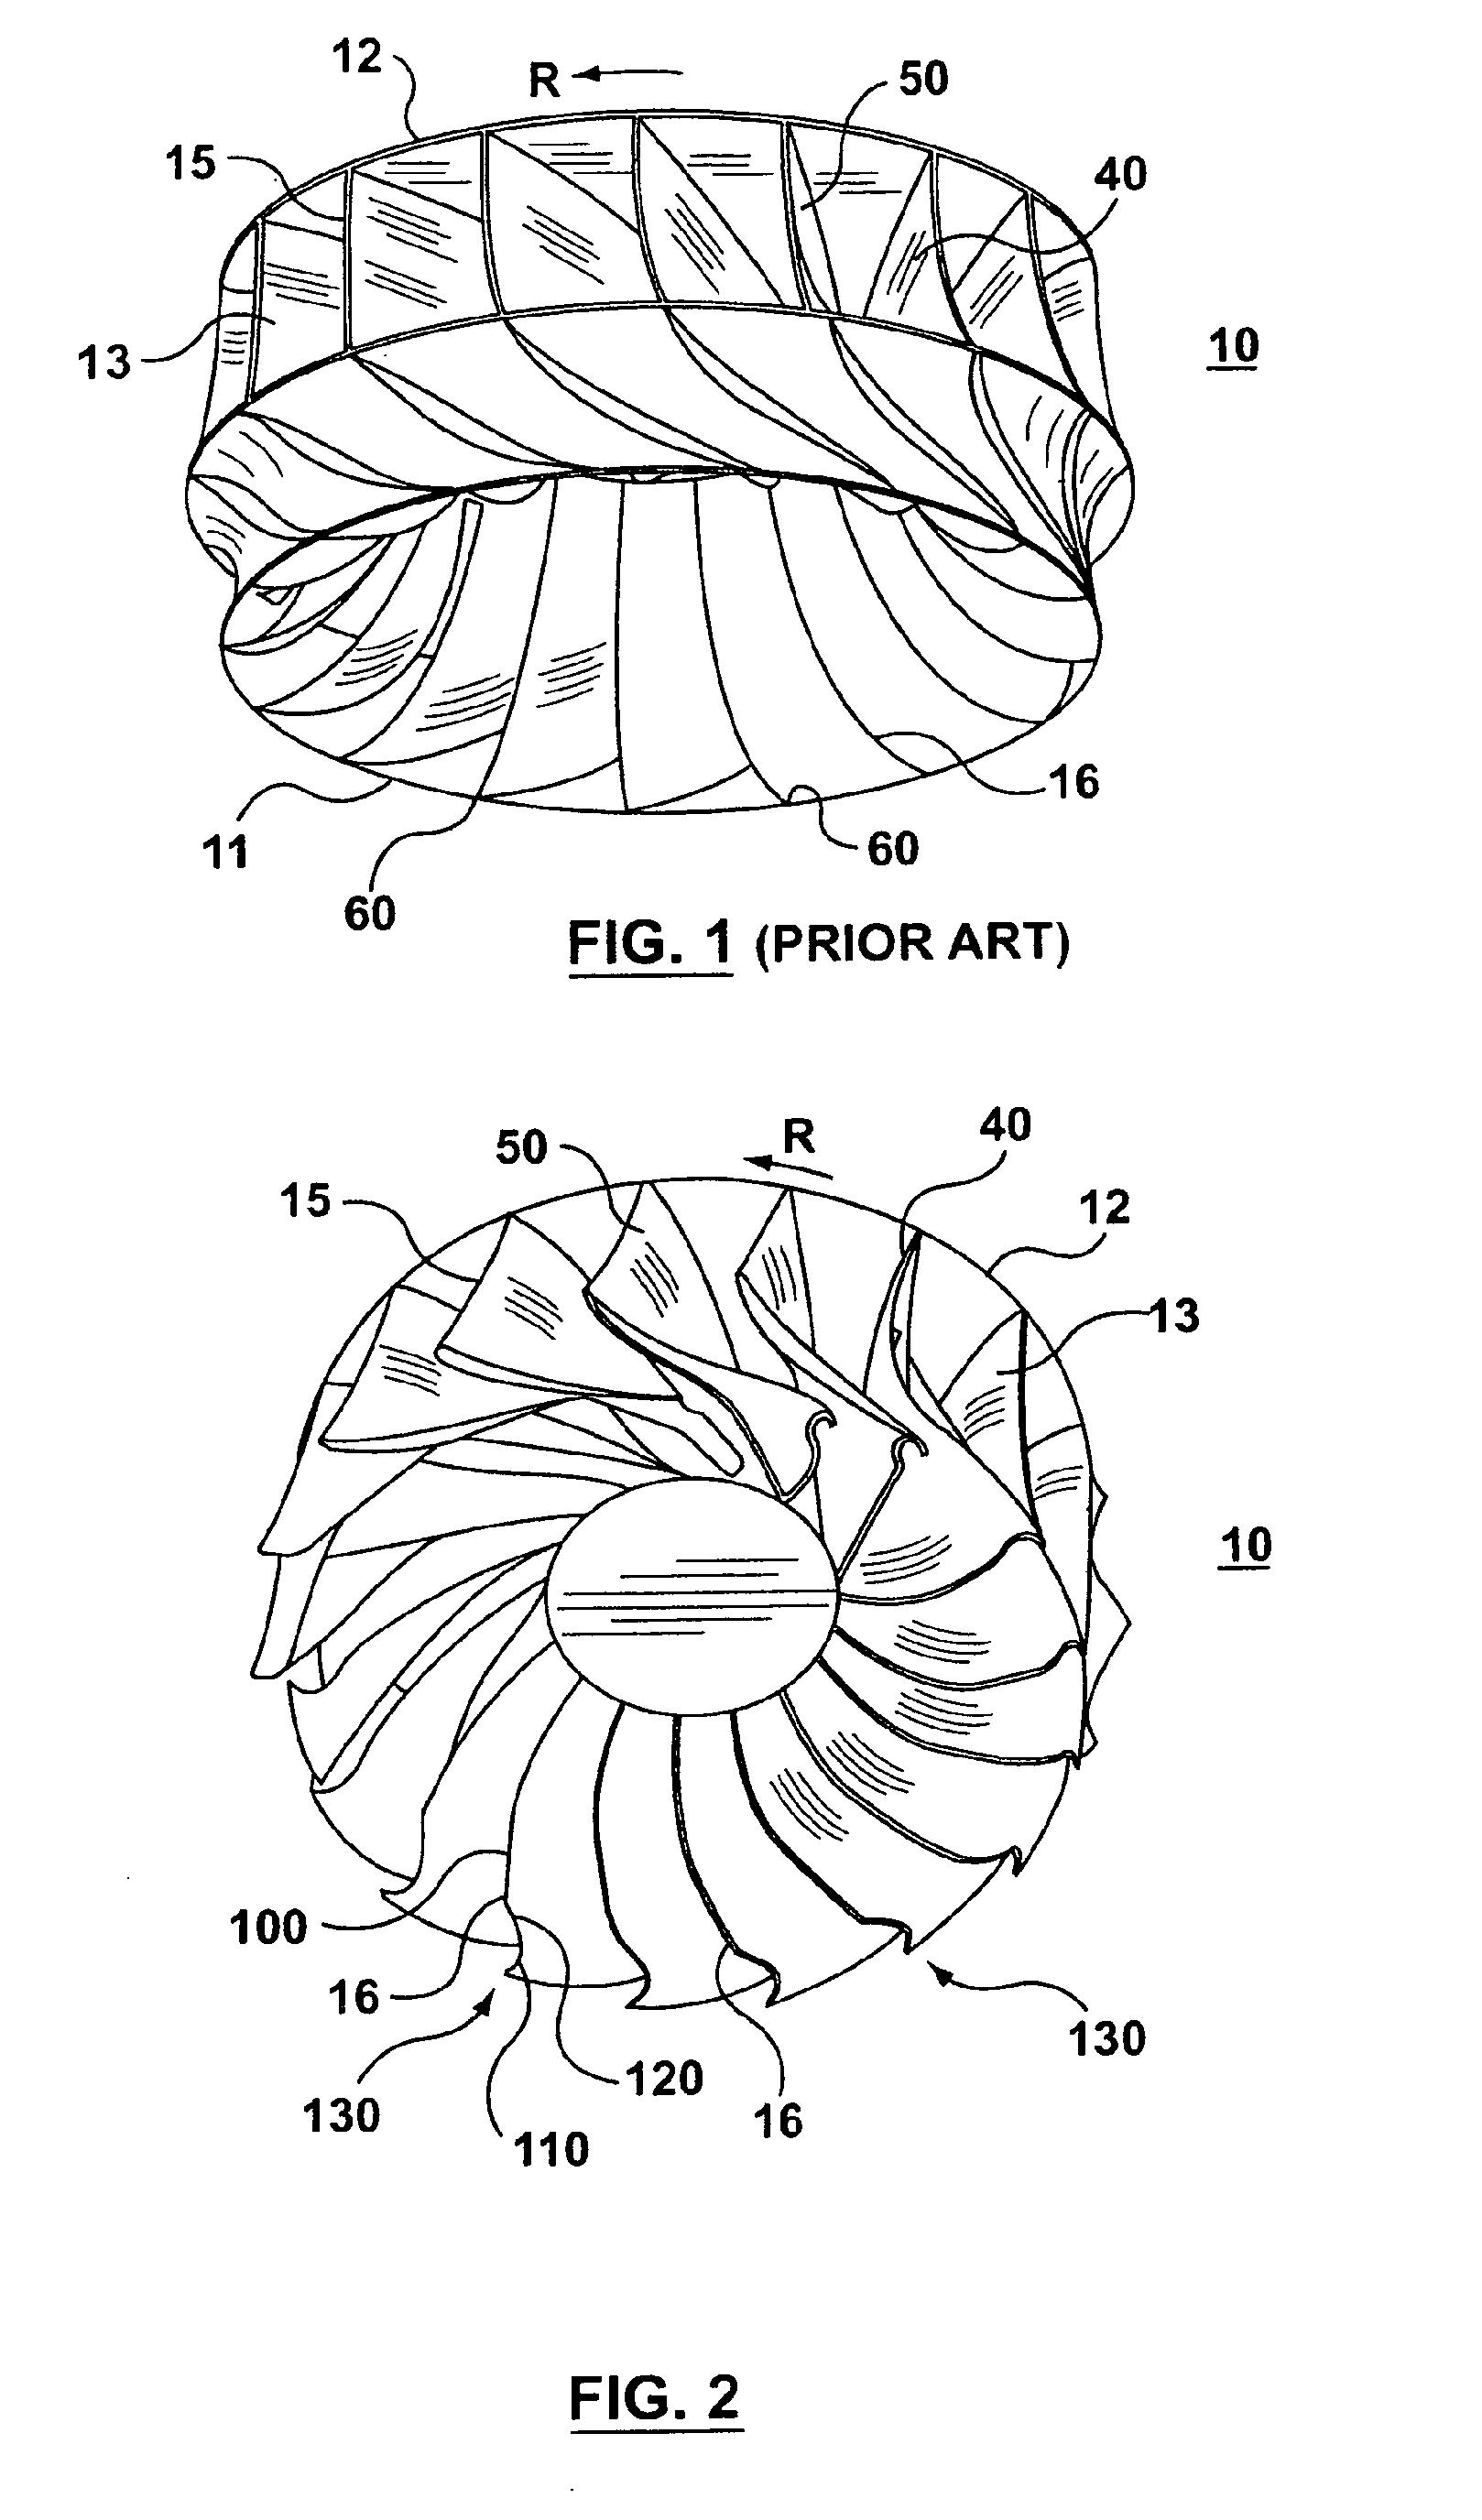 francis turbine diagram hydrofoil diagram